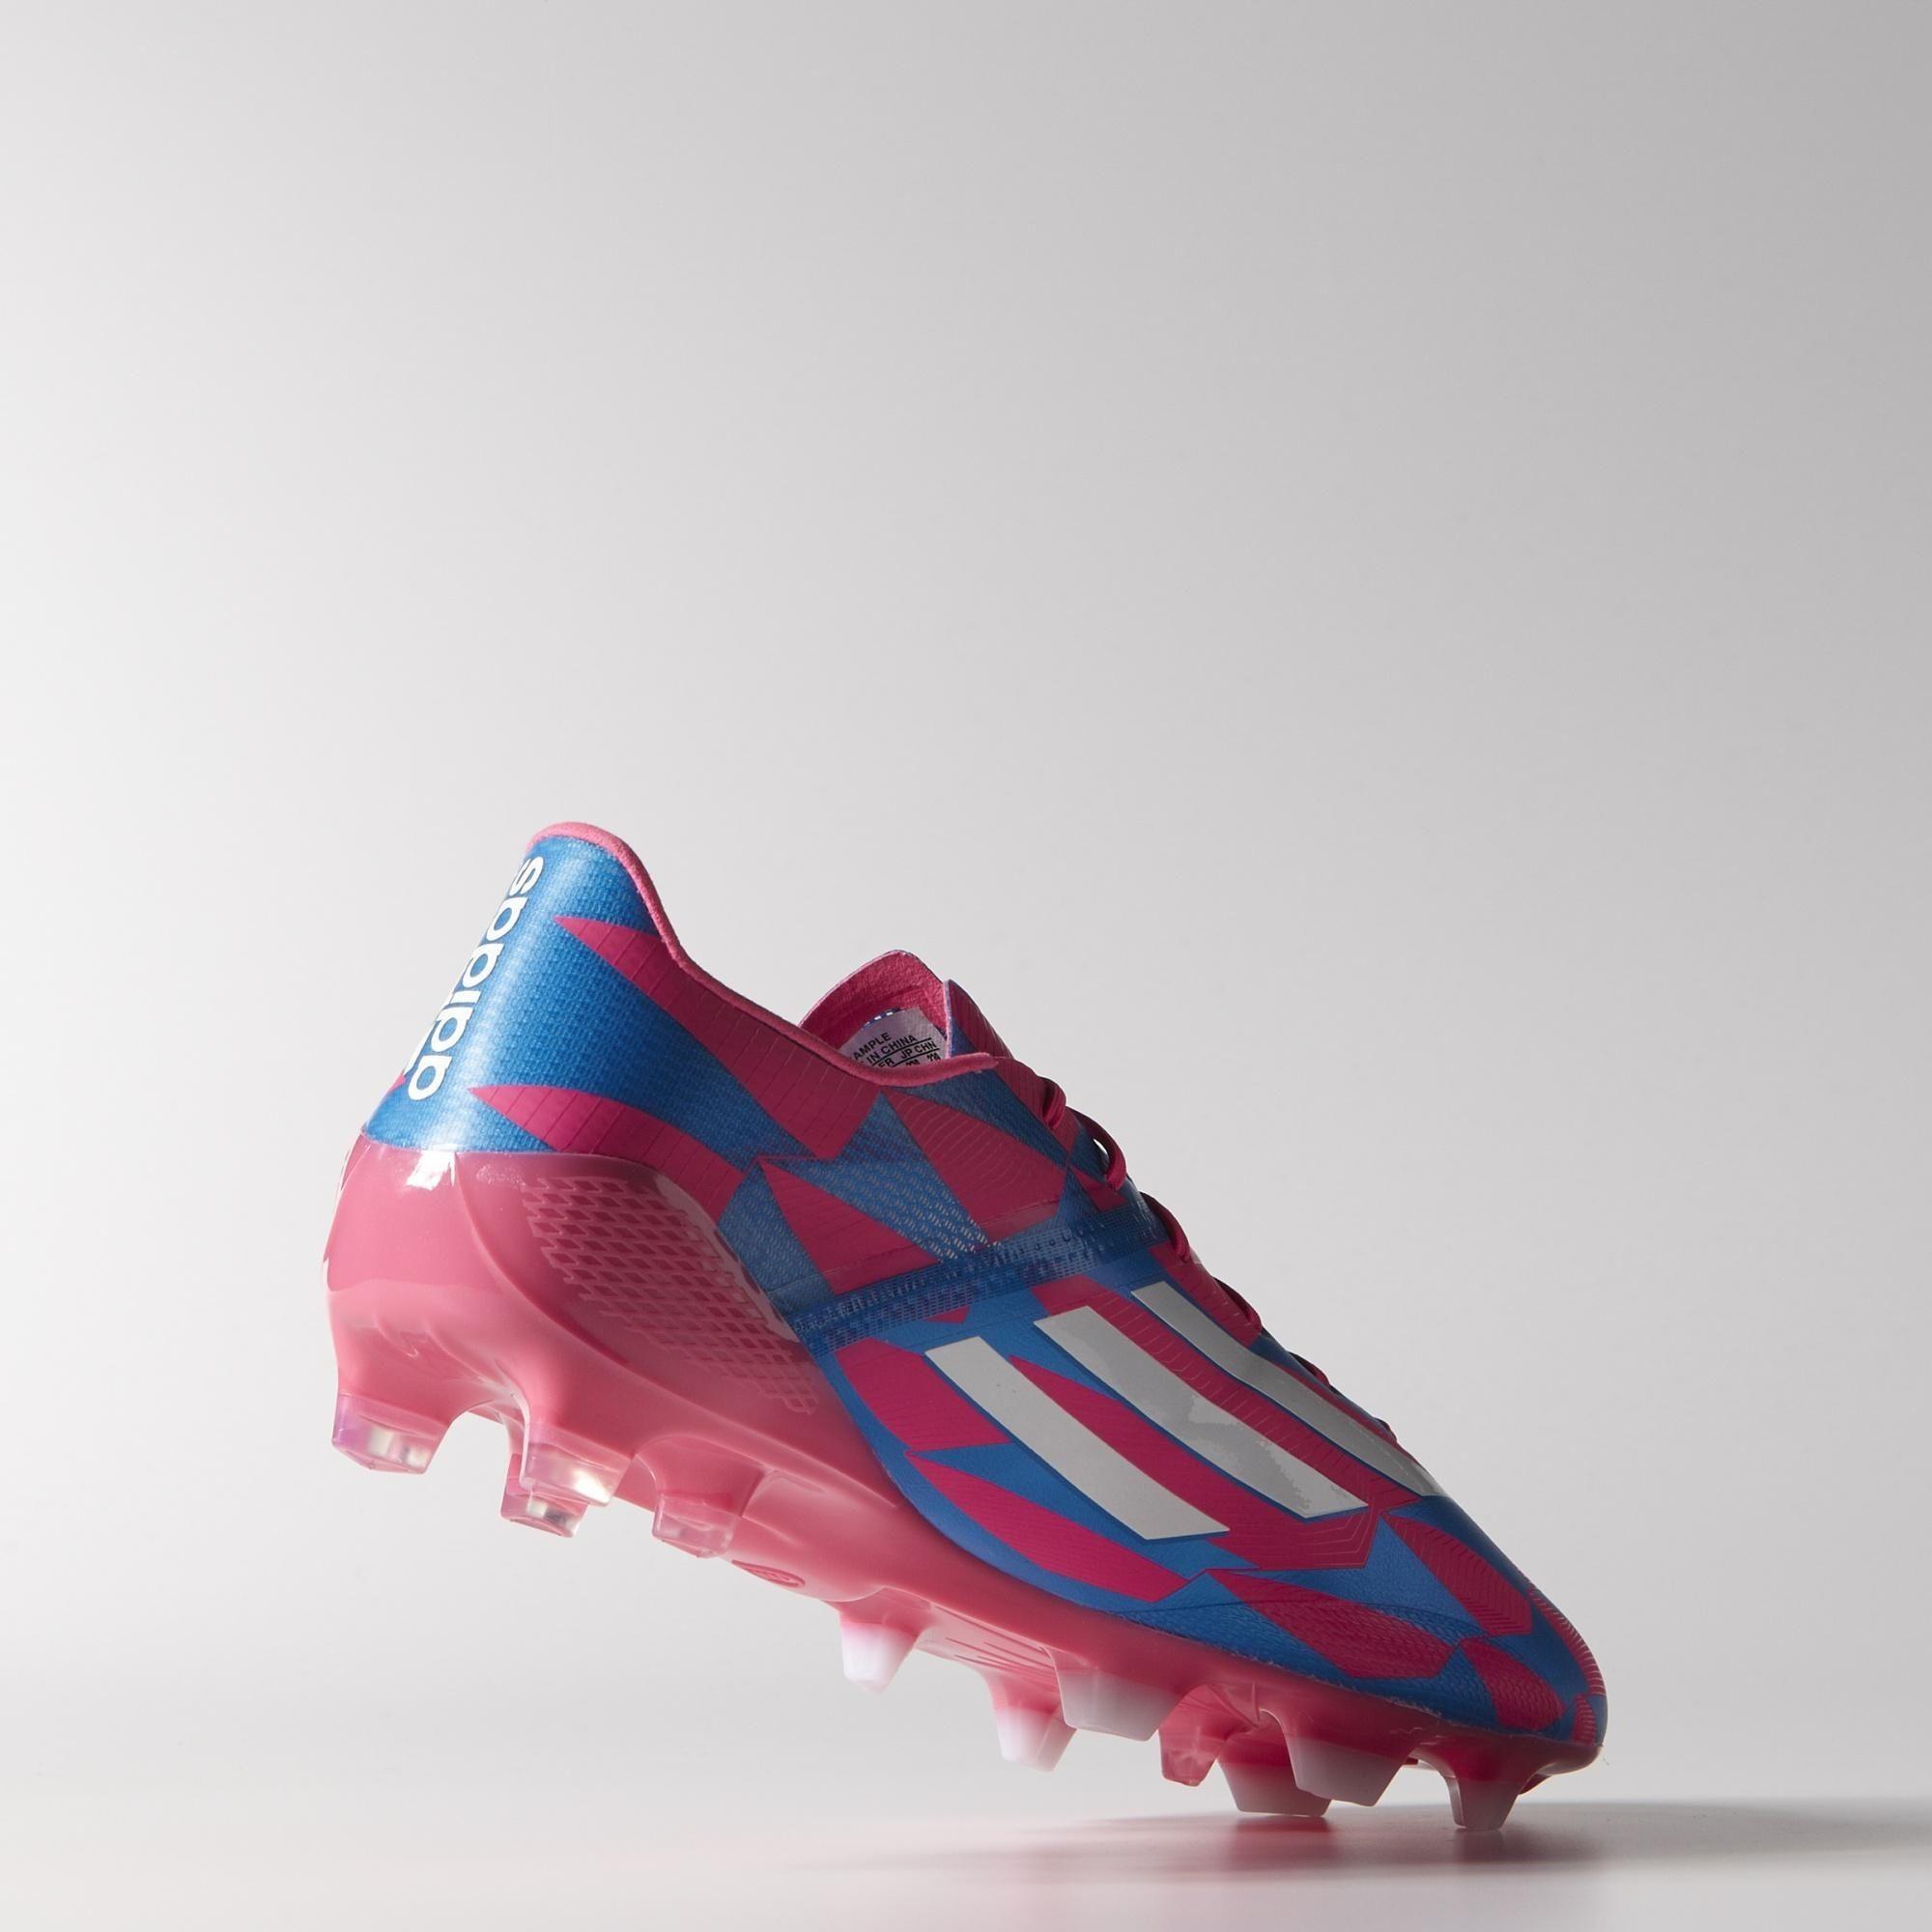 Yükle (1201x700) · Adidas F50 adizero FG Boots - Solar Pink / Core White /  Solar Blue Football boots